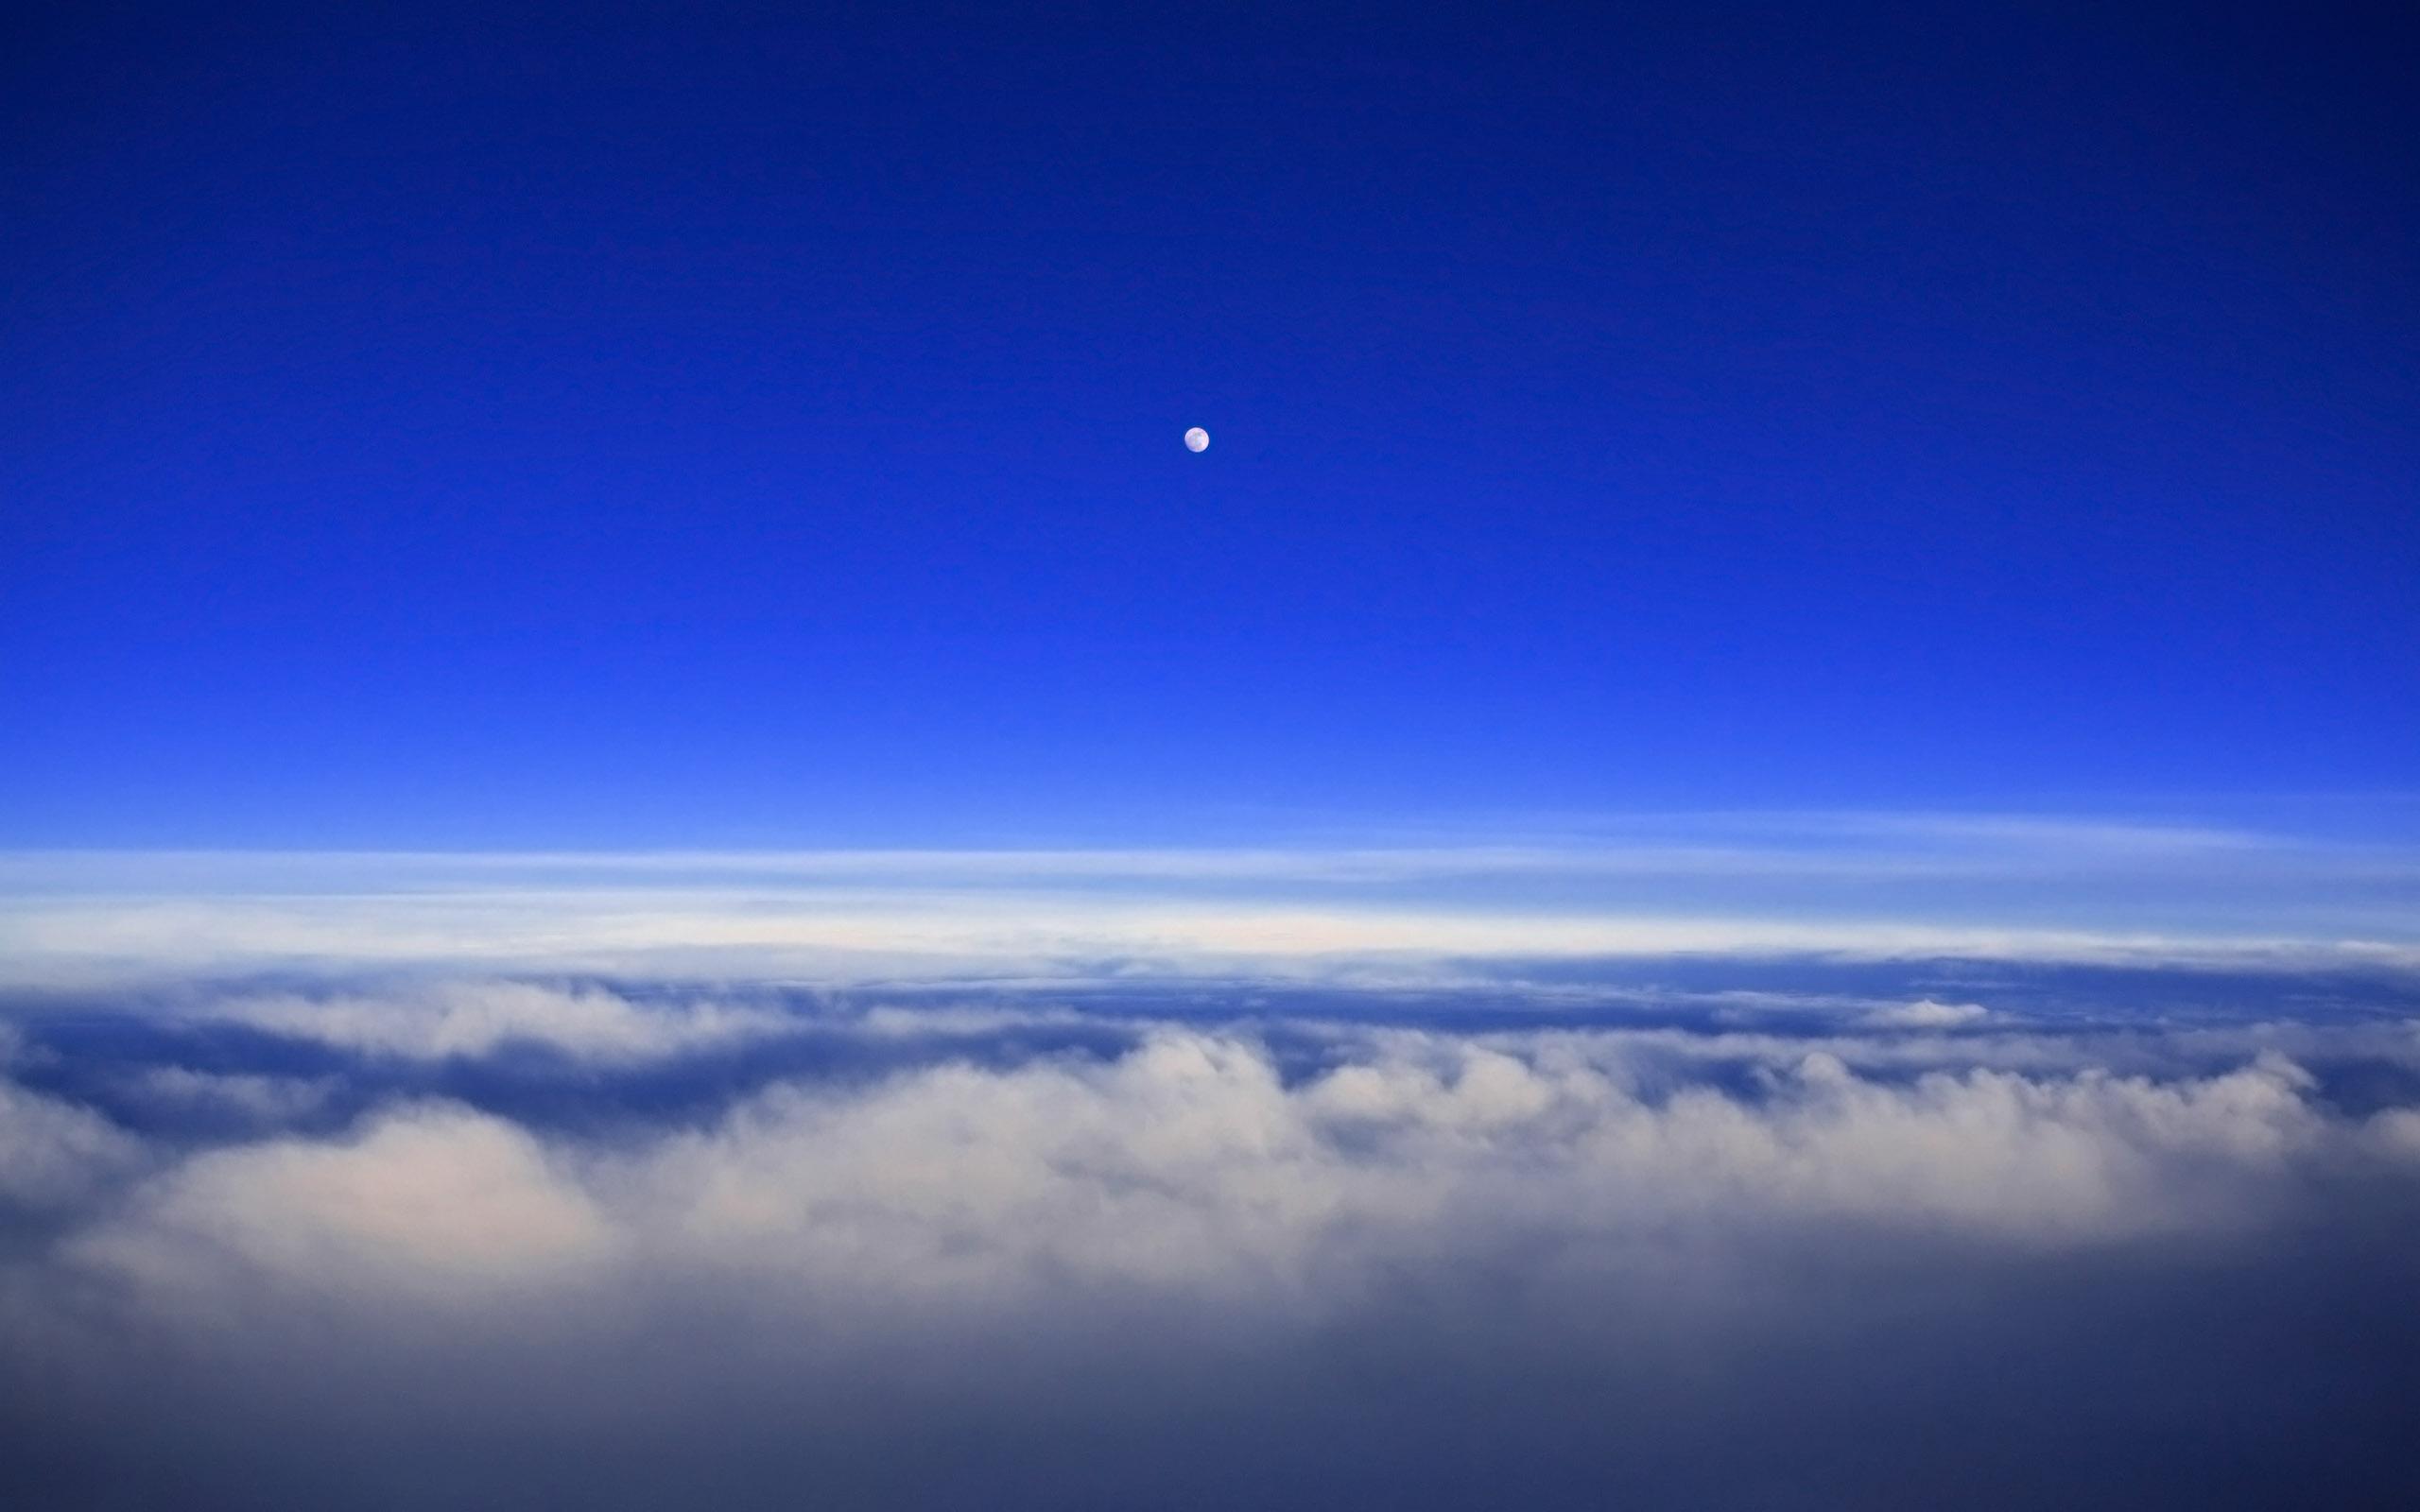 cloud wallpaper blue hd